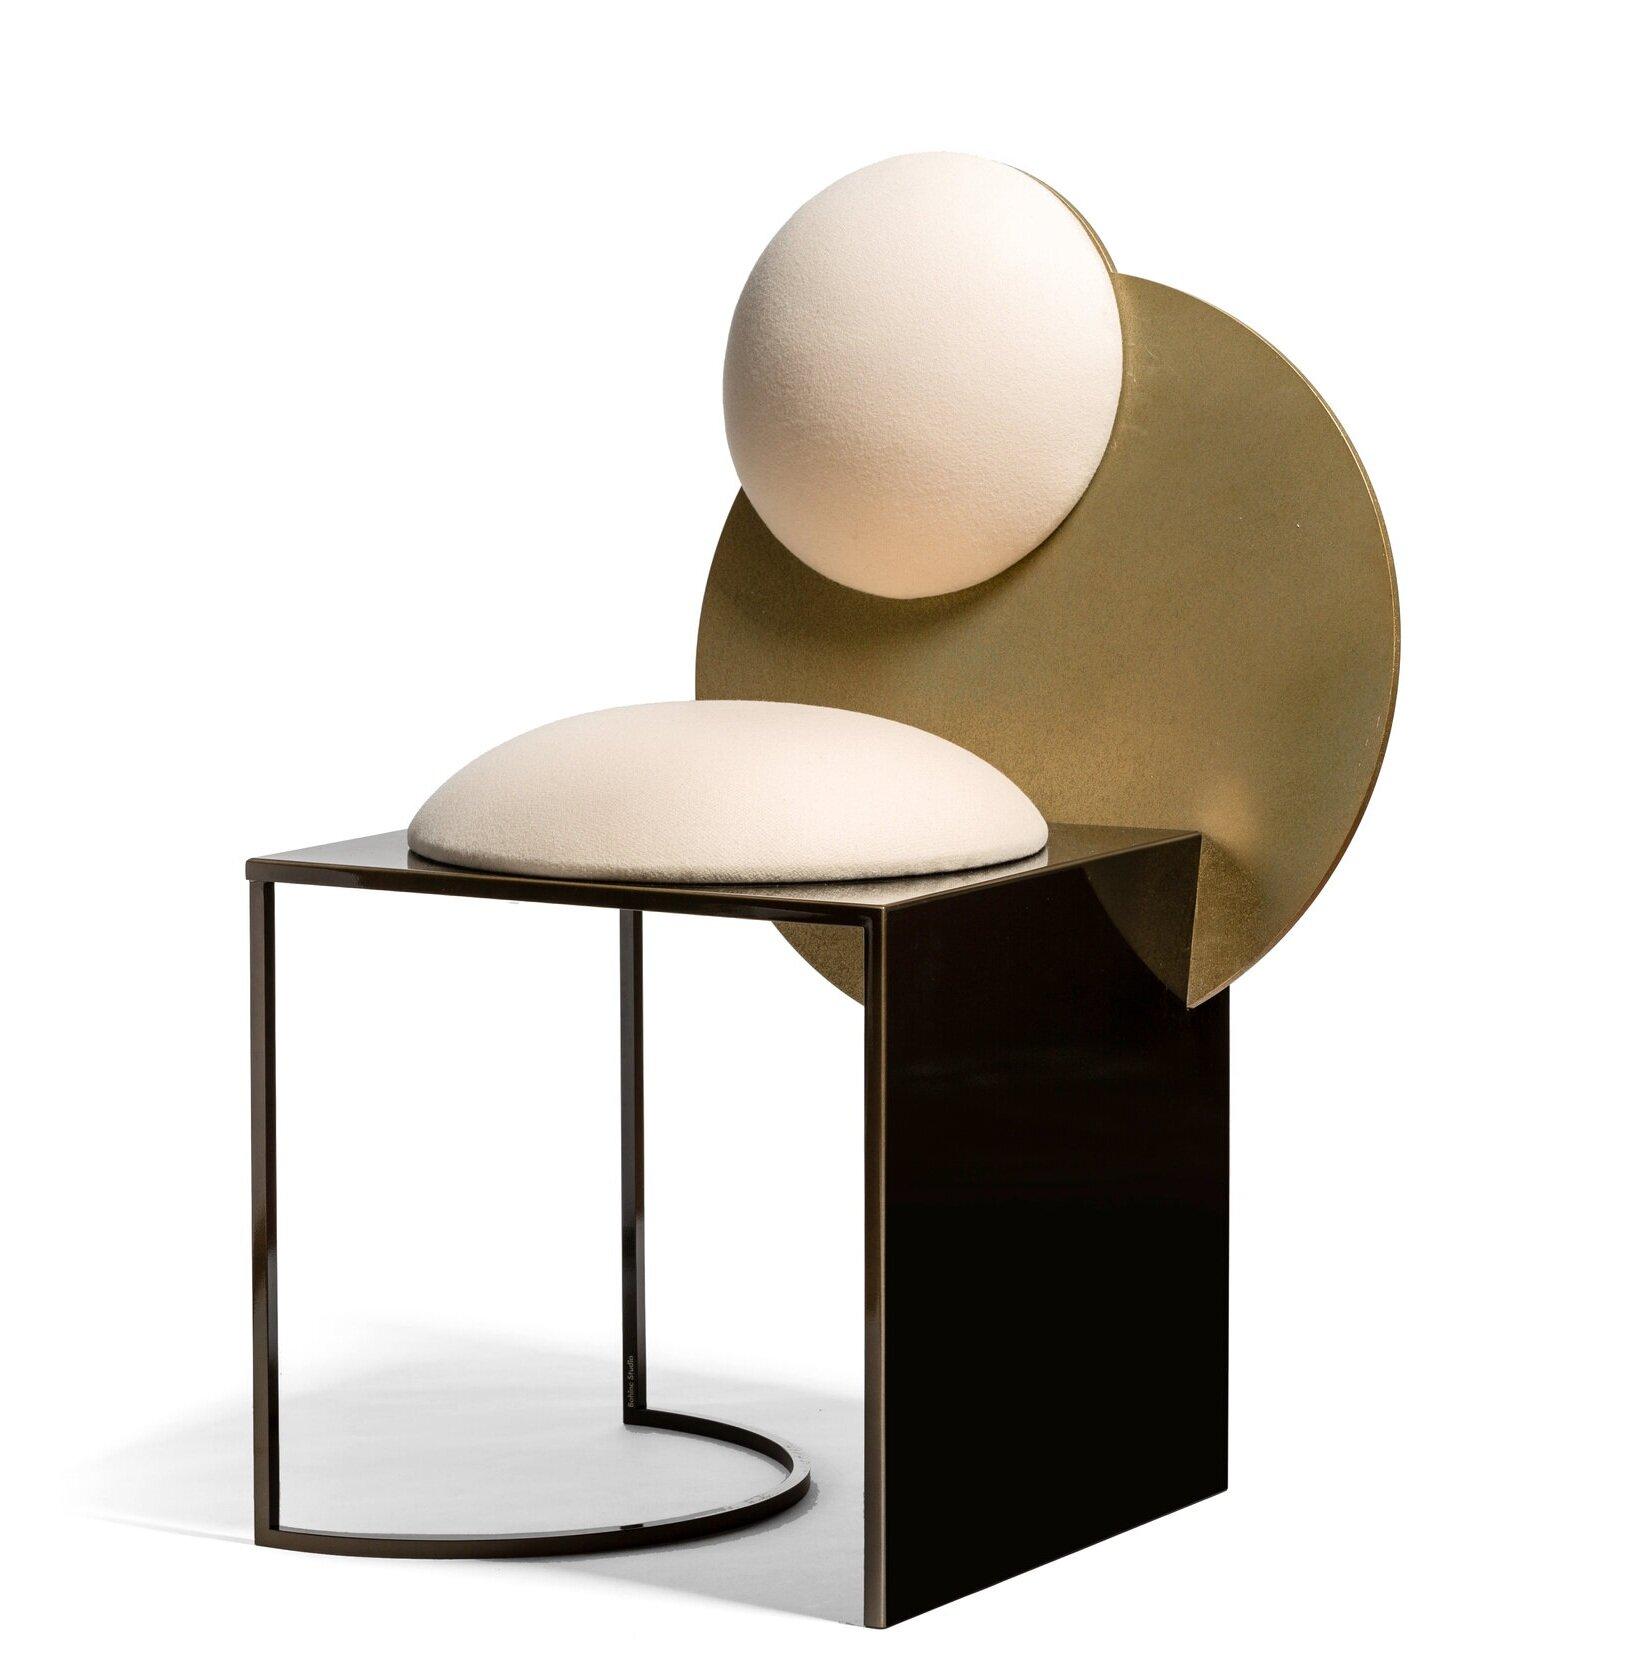 Bohinc+Studio+-+Celeste+Chair+-+Black+and+Brass+00.jpg